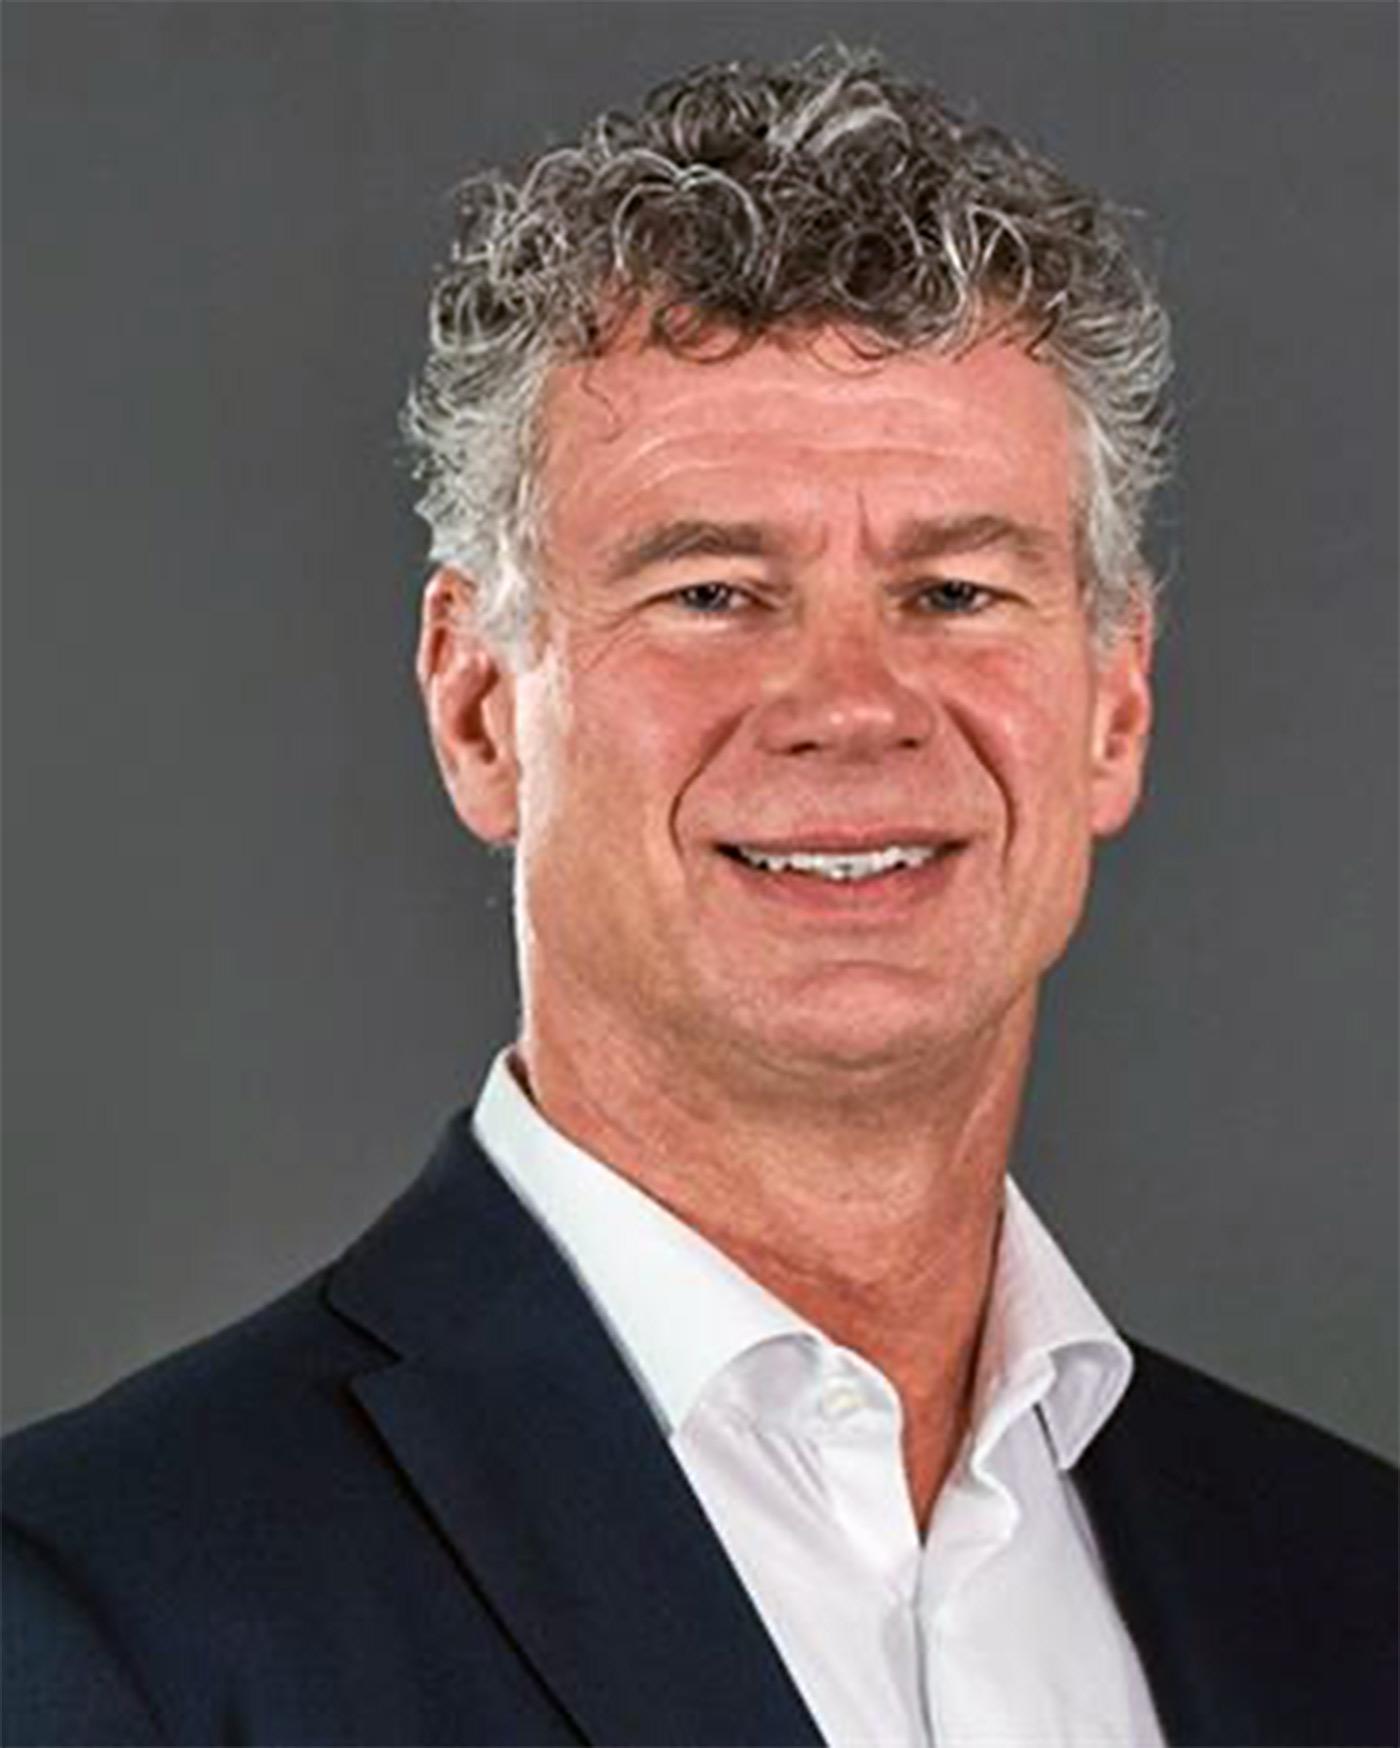 Dr. Burkhard Bonsels